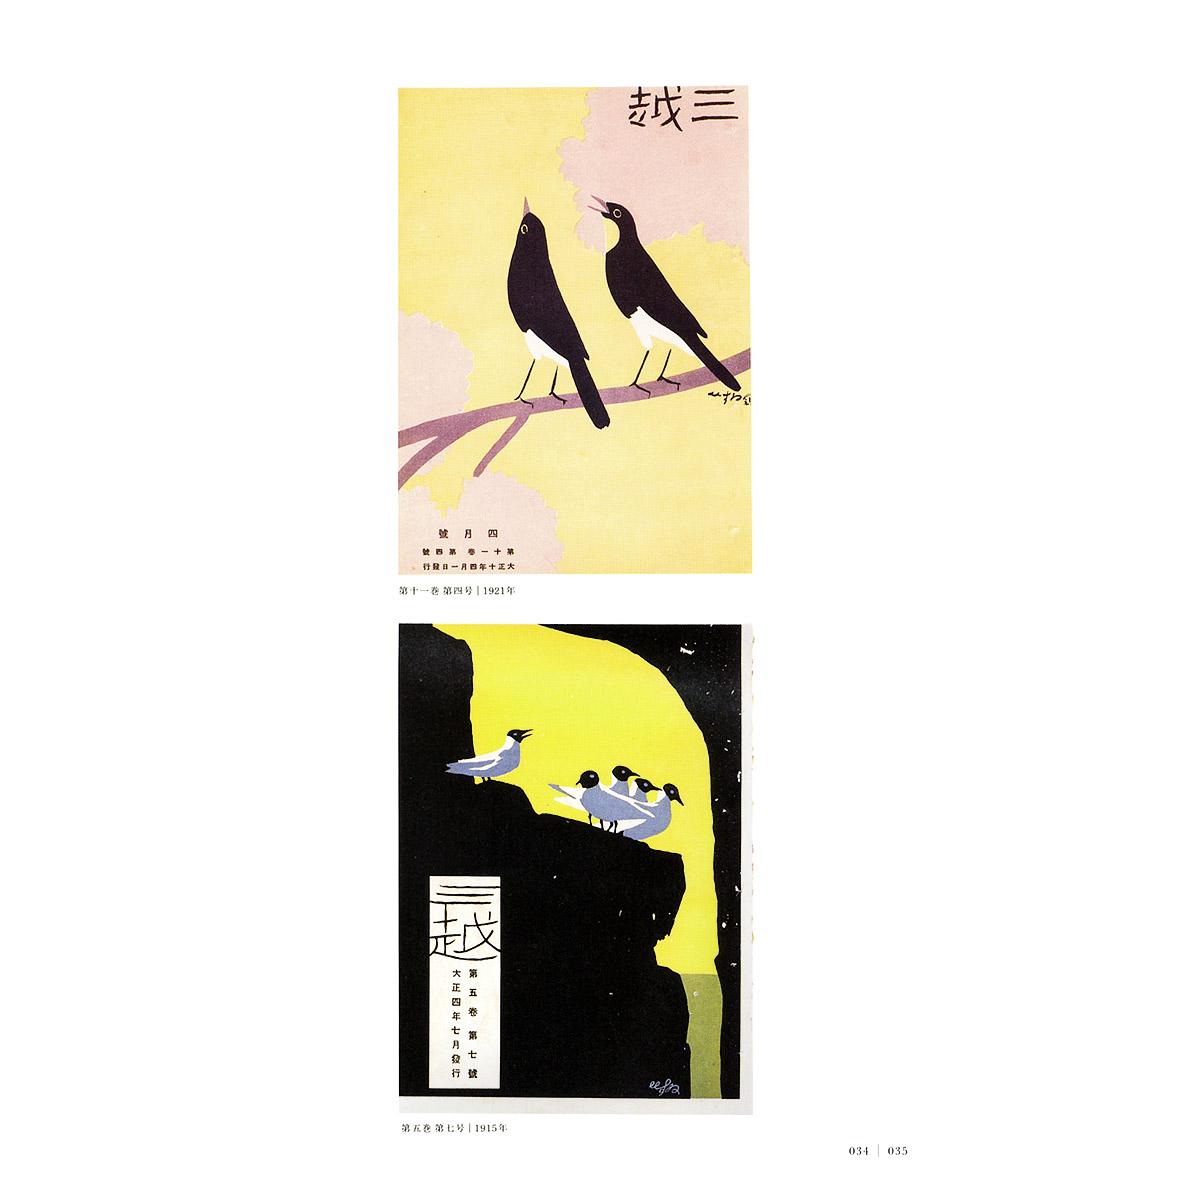 Hisui Sugiura: A Pioneer of Japanese Graphic Design